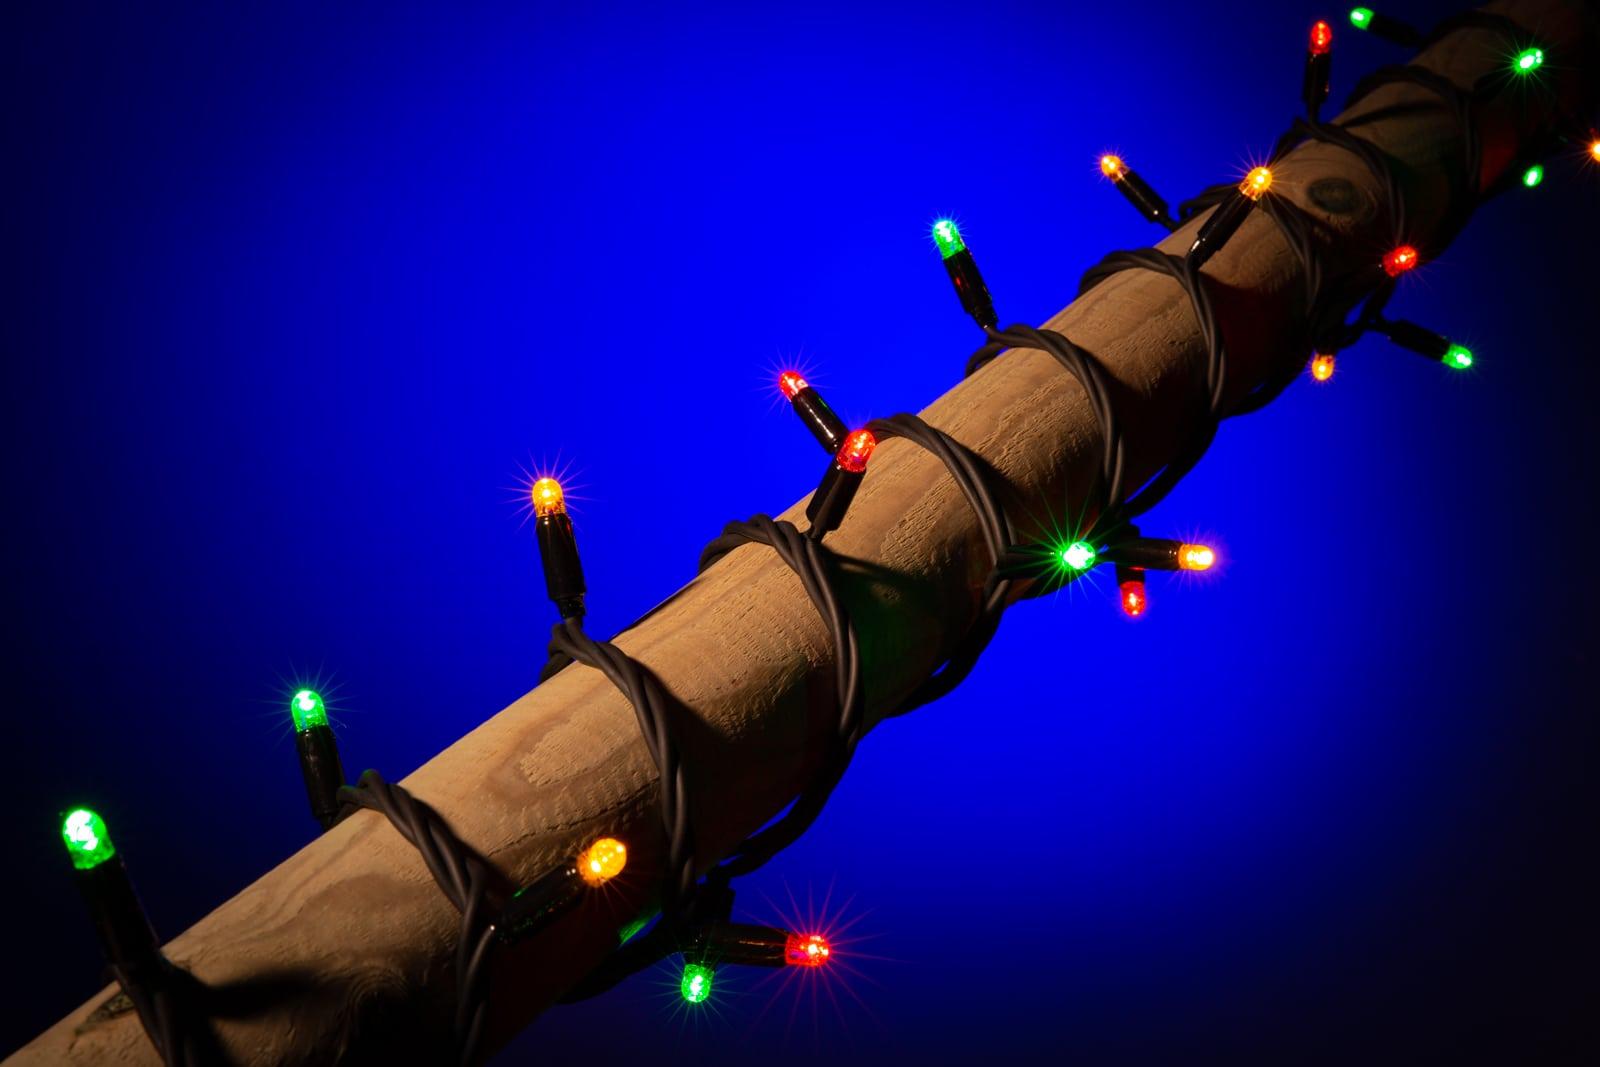 Carnavalsverlichting • Rood Geel Groen lampjes • 100 LED lampjes